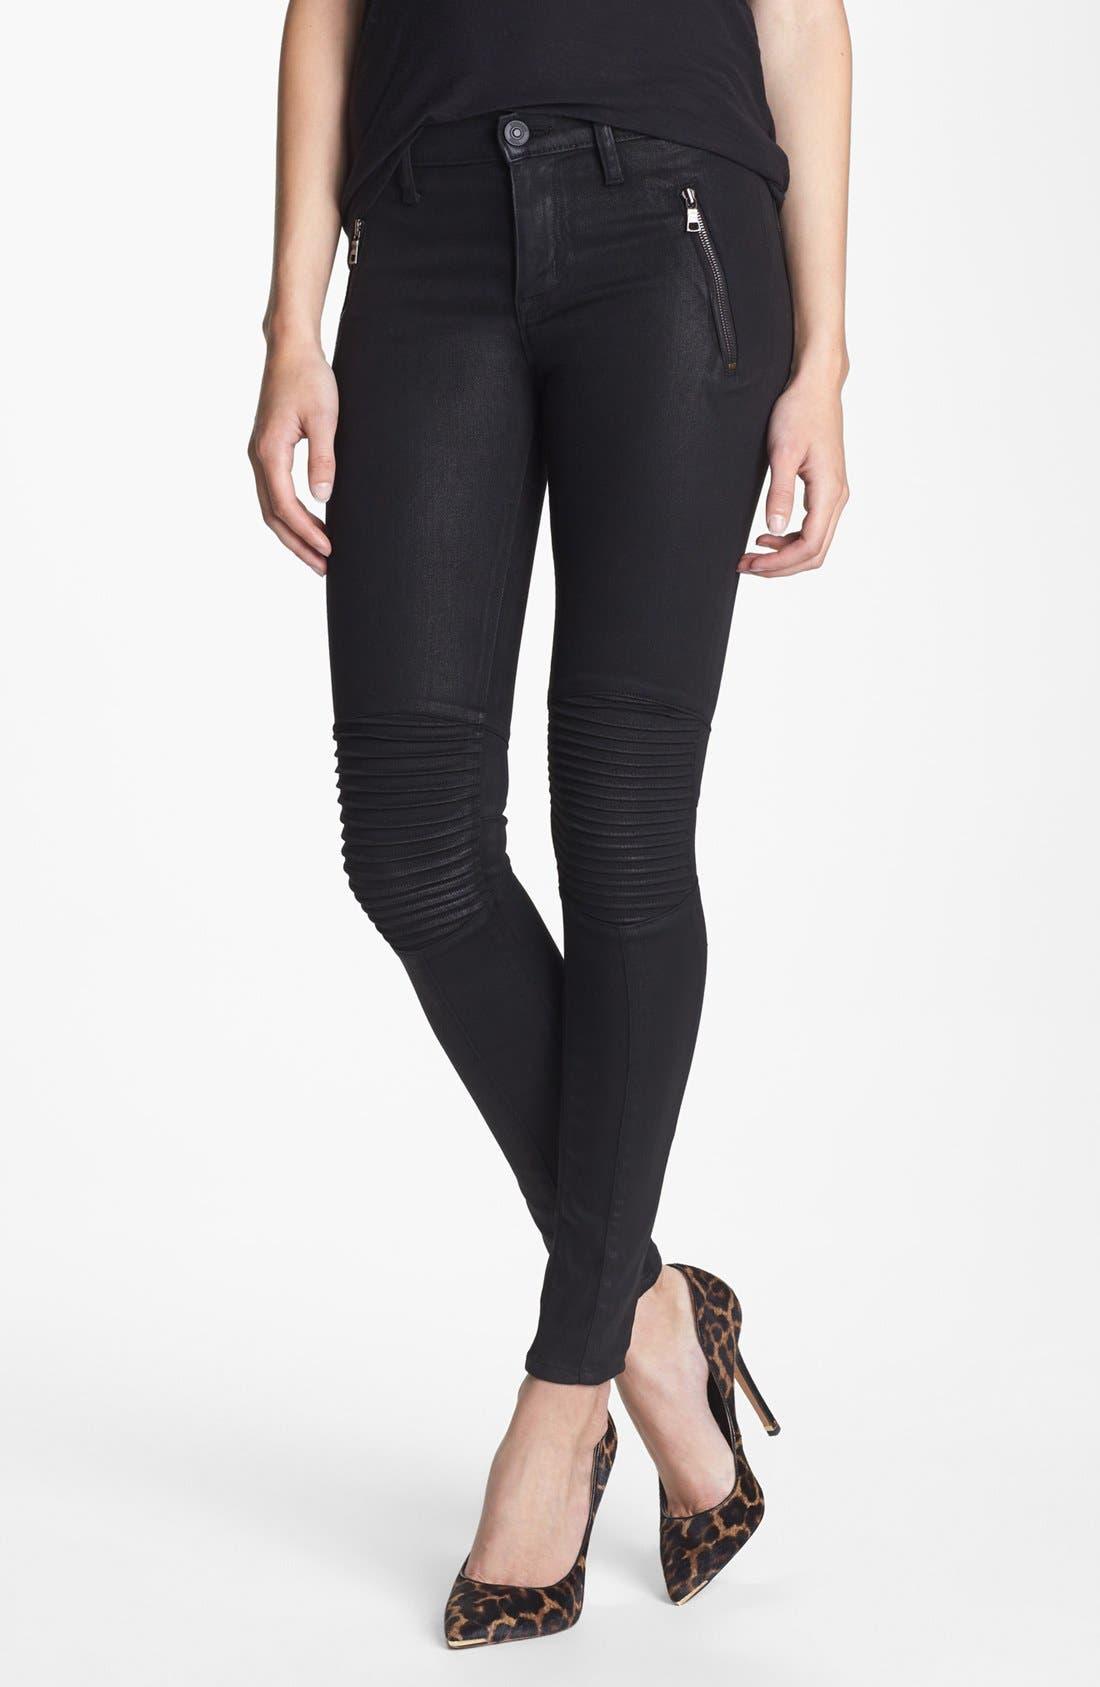 Alternate Image 1 Selected - Hudson Jeans 'Stark' Moto Skinny Jeans (Jet Black)